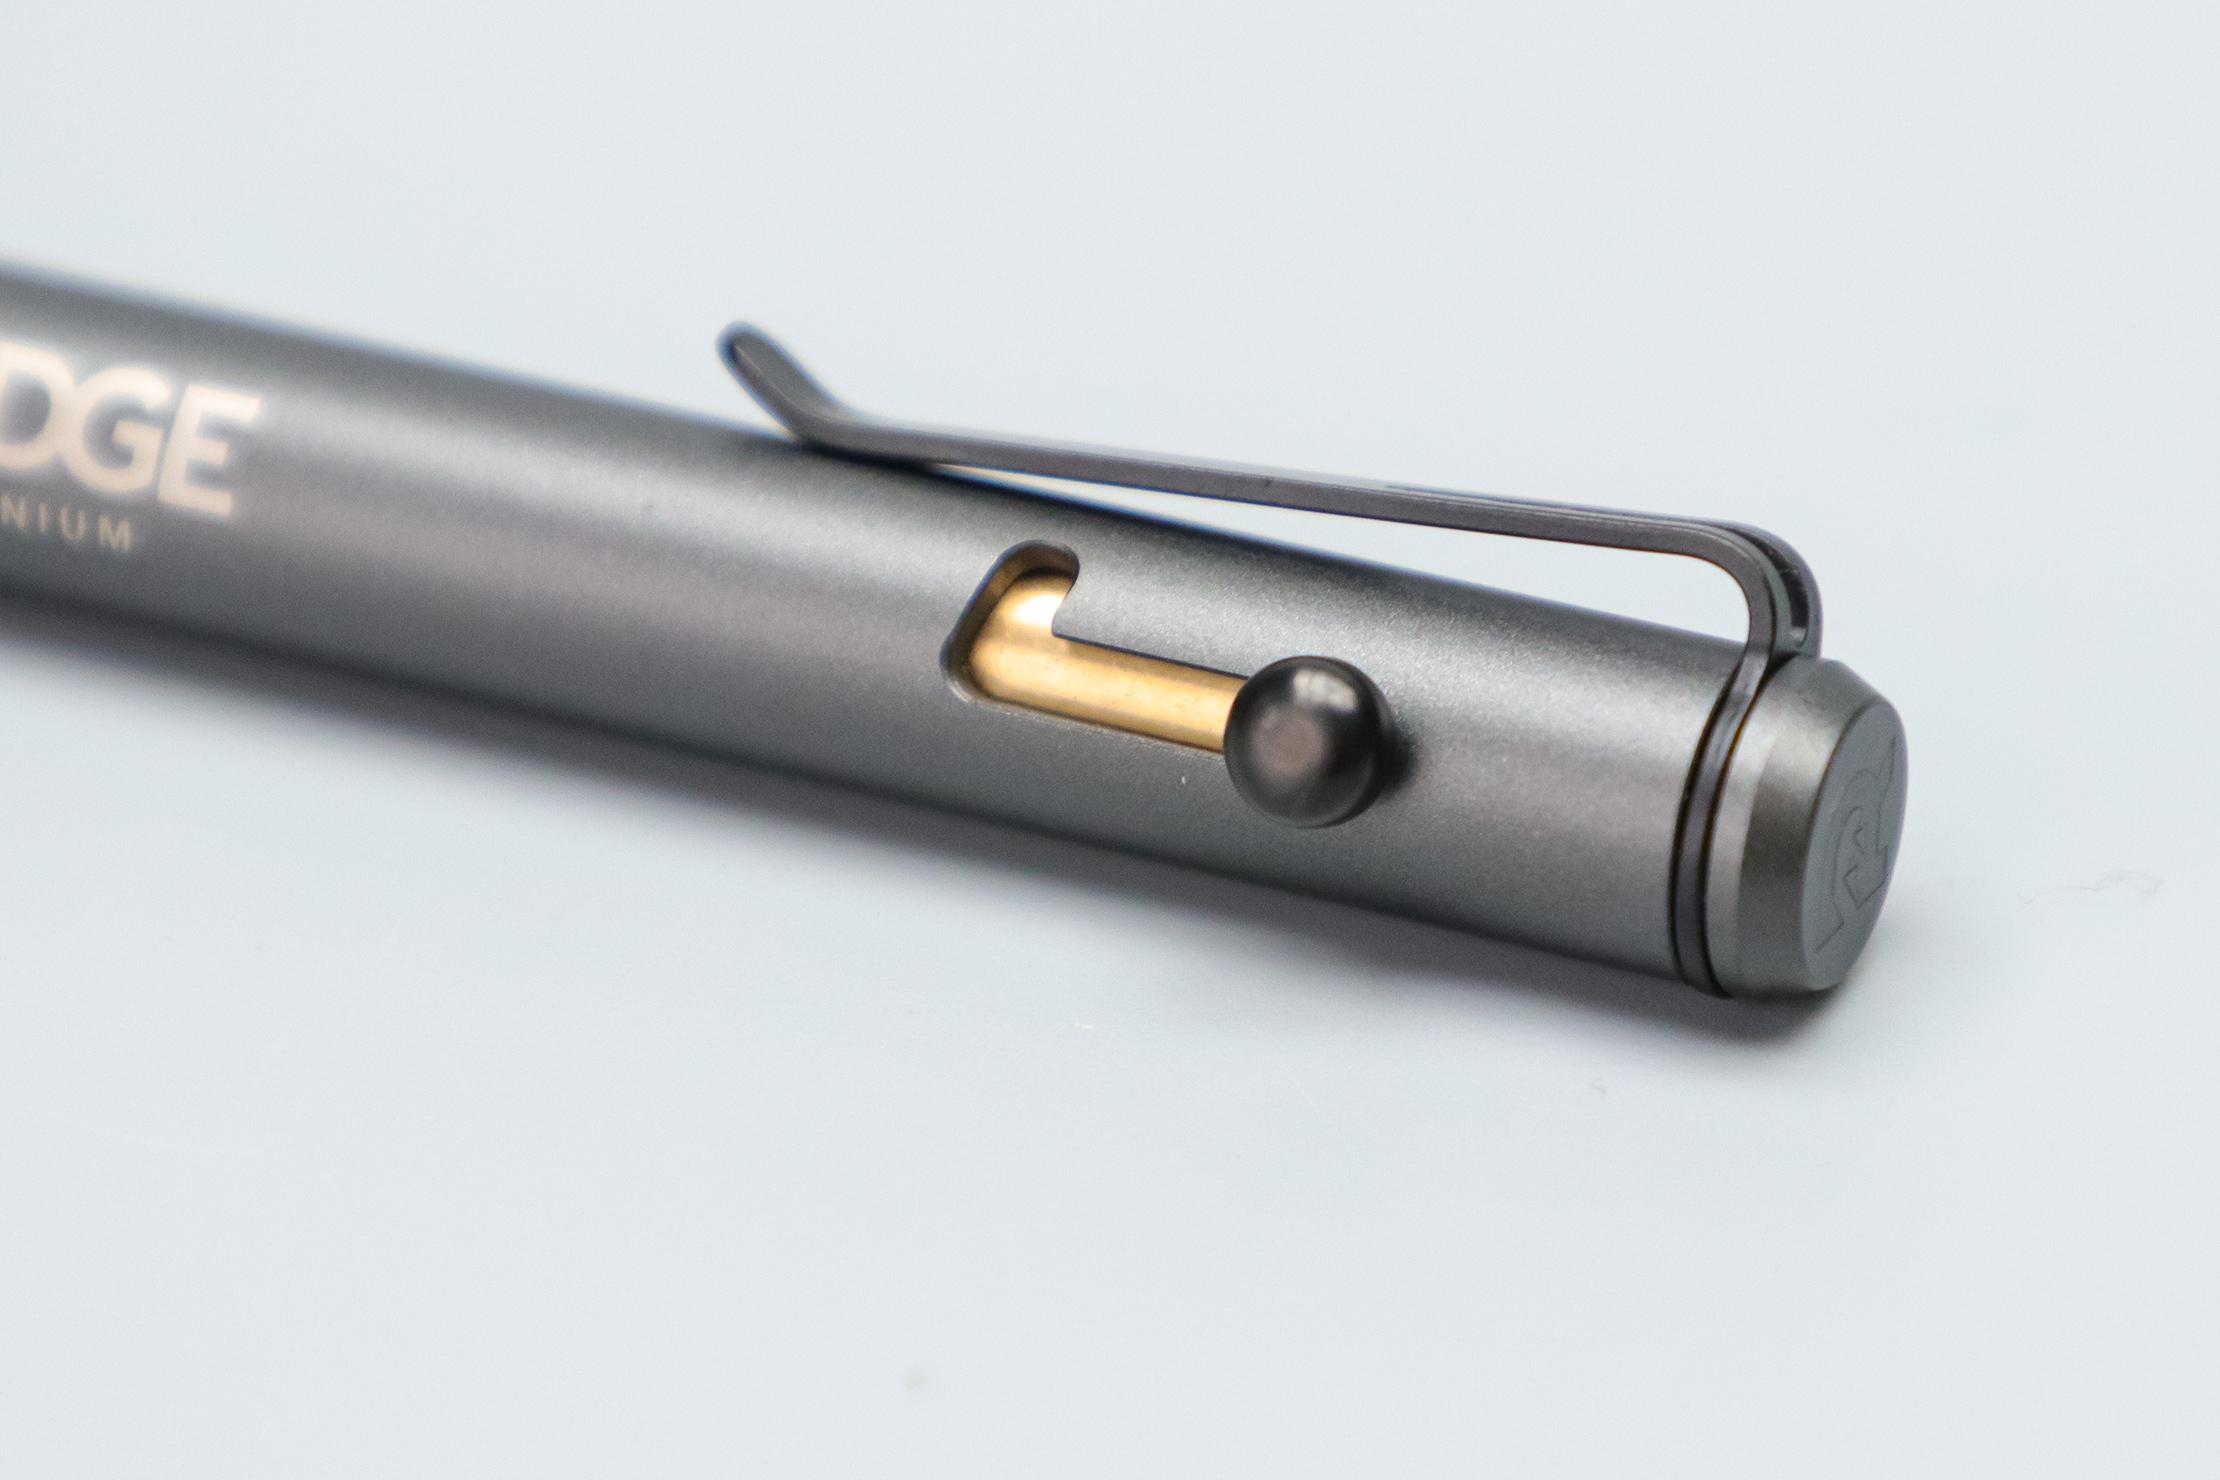 The Ridge Bolt Action Pen trigger mechanism